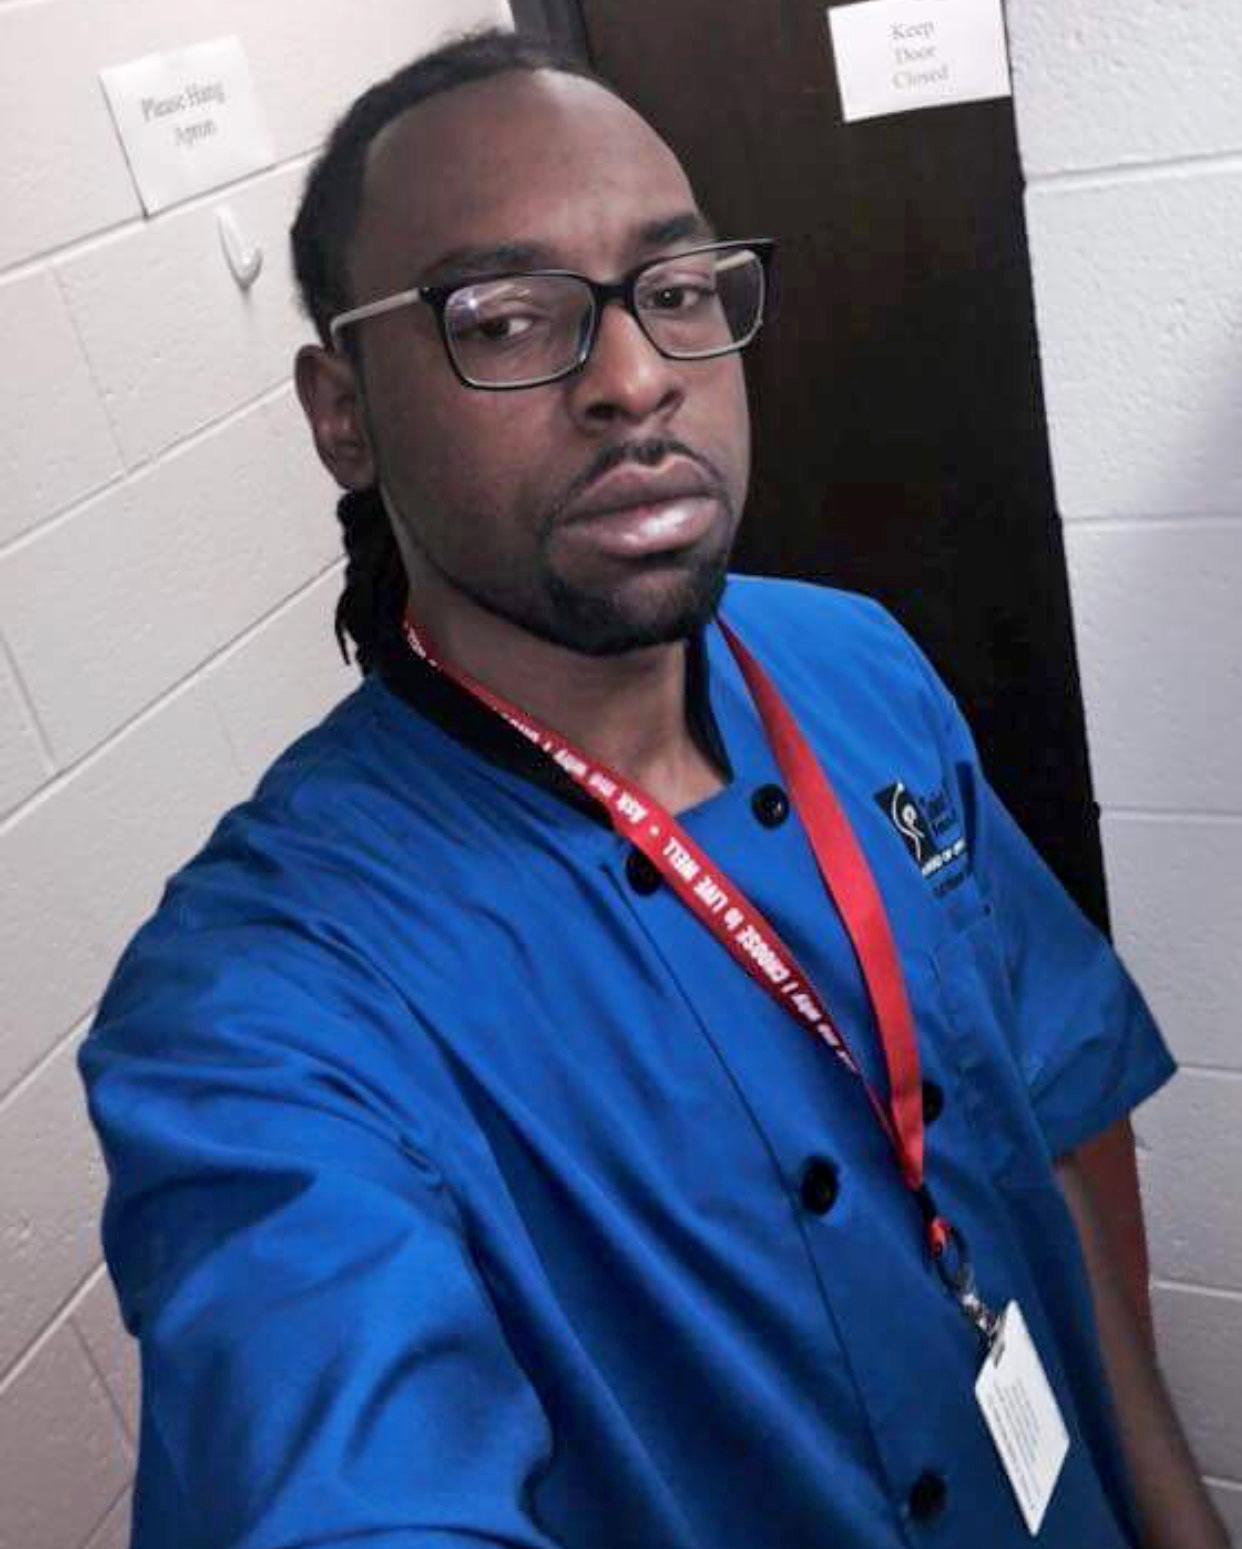 Image: Philando Castile